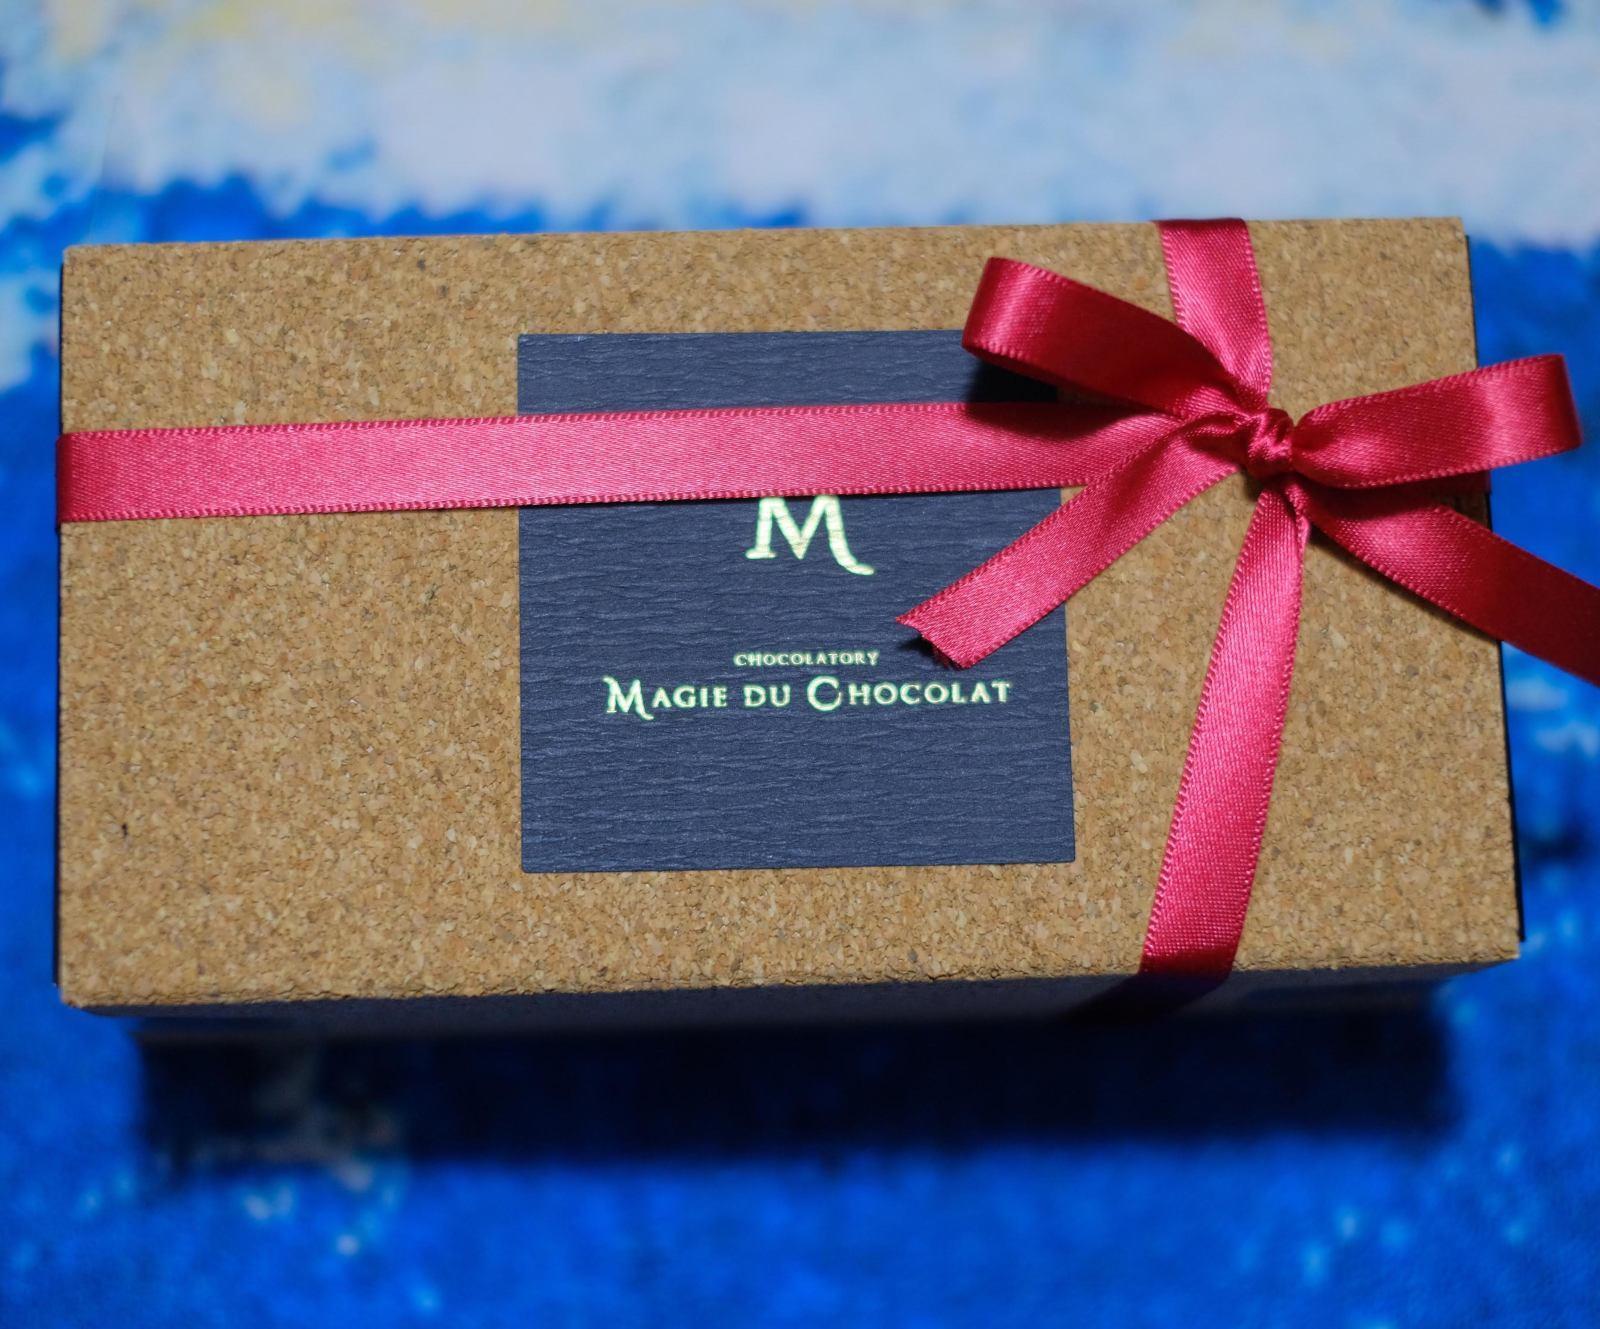 Magie du chocolat(マジドショコラ)@自由が丘 優雅なチョコレート屋さんでホワイトデーお返しと自分用ご褒美!_b0024832_00011172.jpg